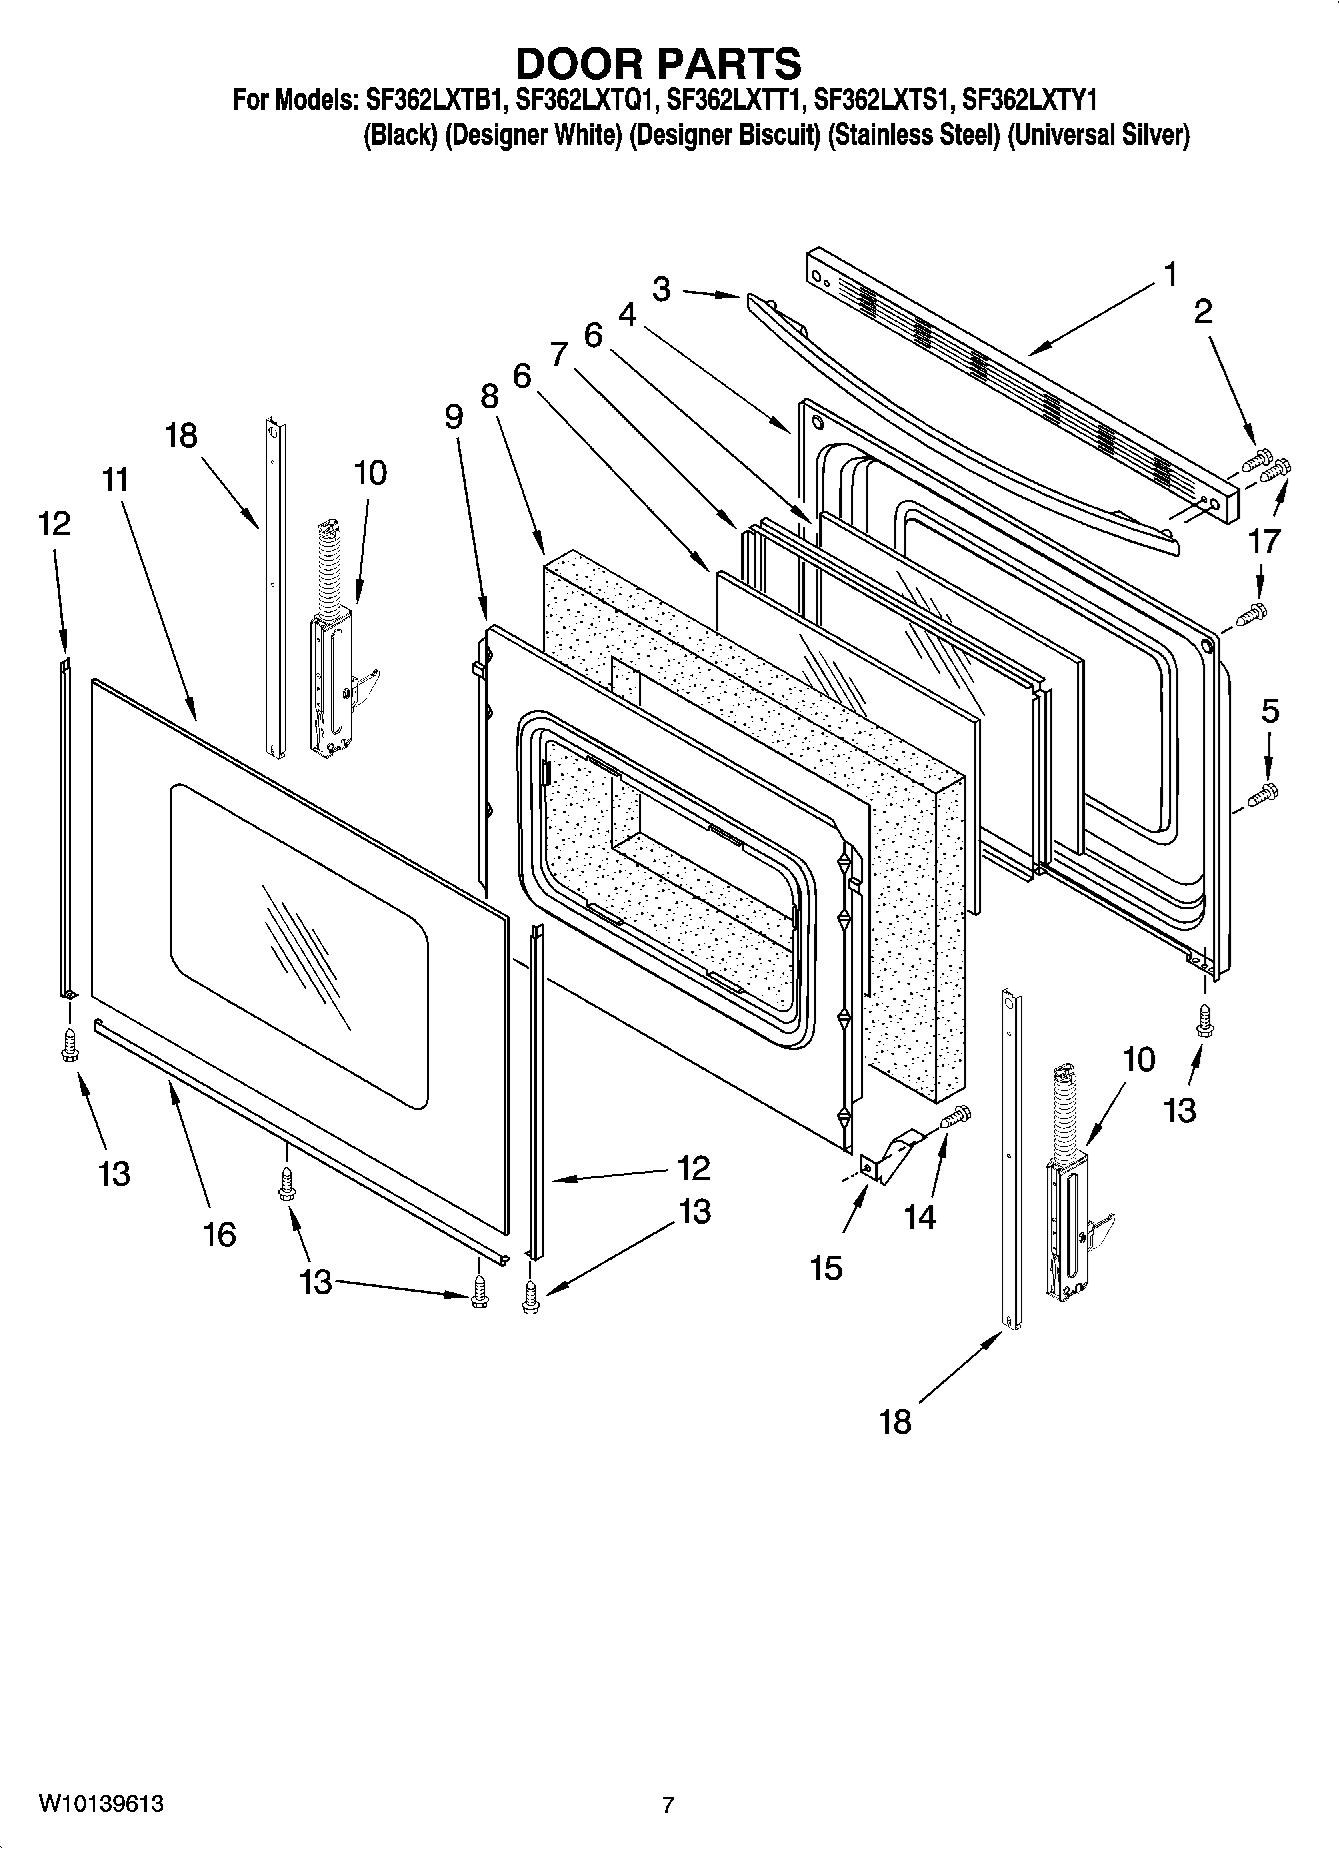 WhirlpoolImg_19000101 20150716_00190076?width\\\\\\\=2000 whirlpool refrigerator schematic diagram model tt14dkxkq00  at gsmx.co